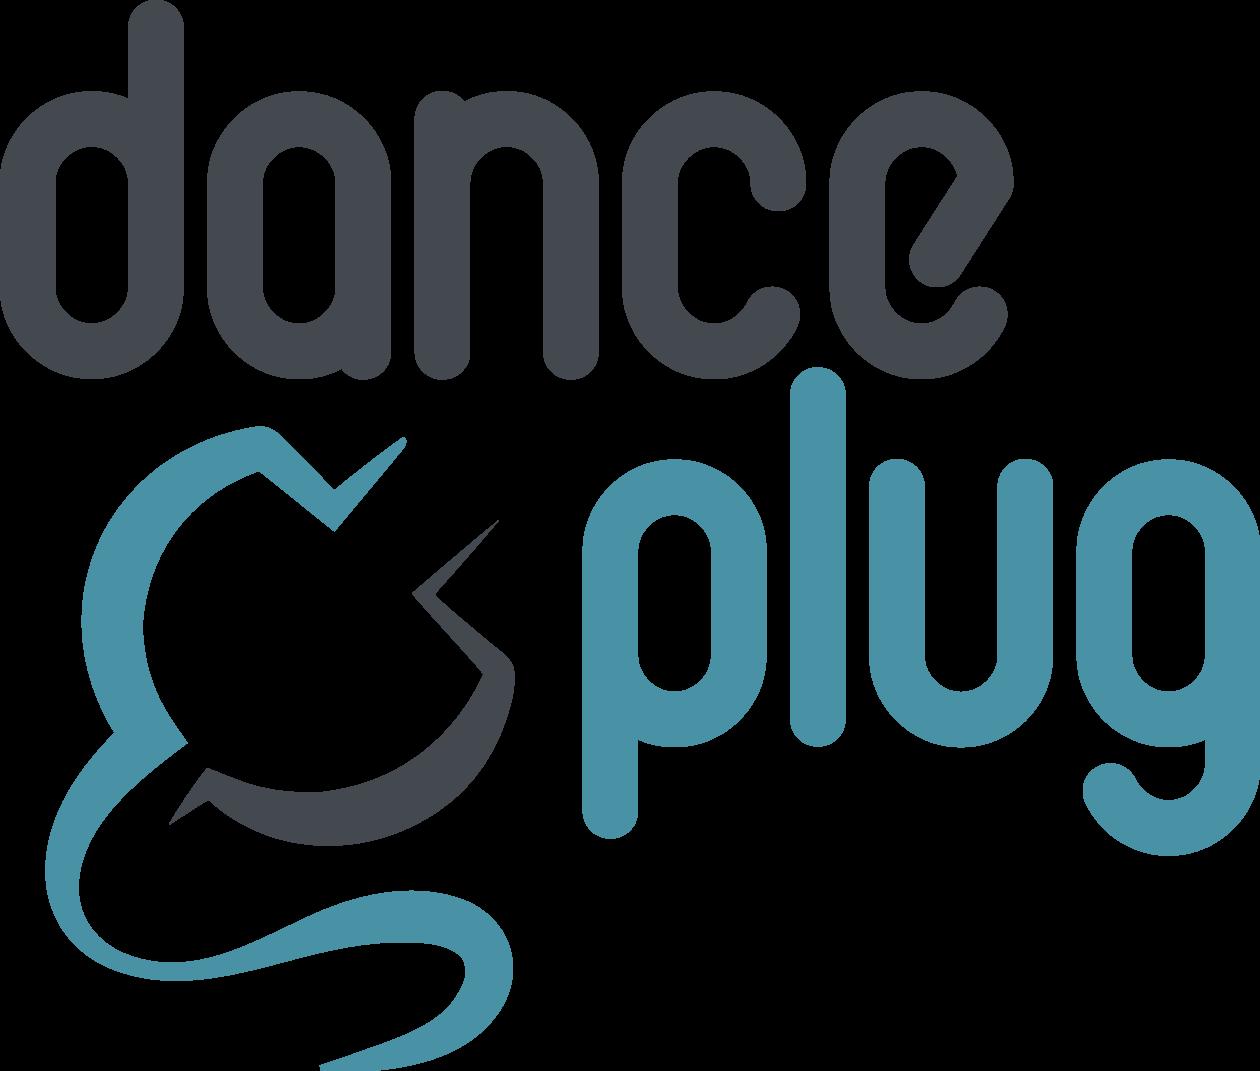 danceplug_1_0.png